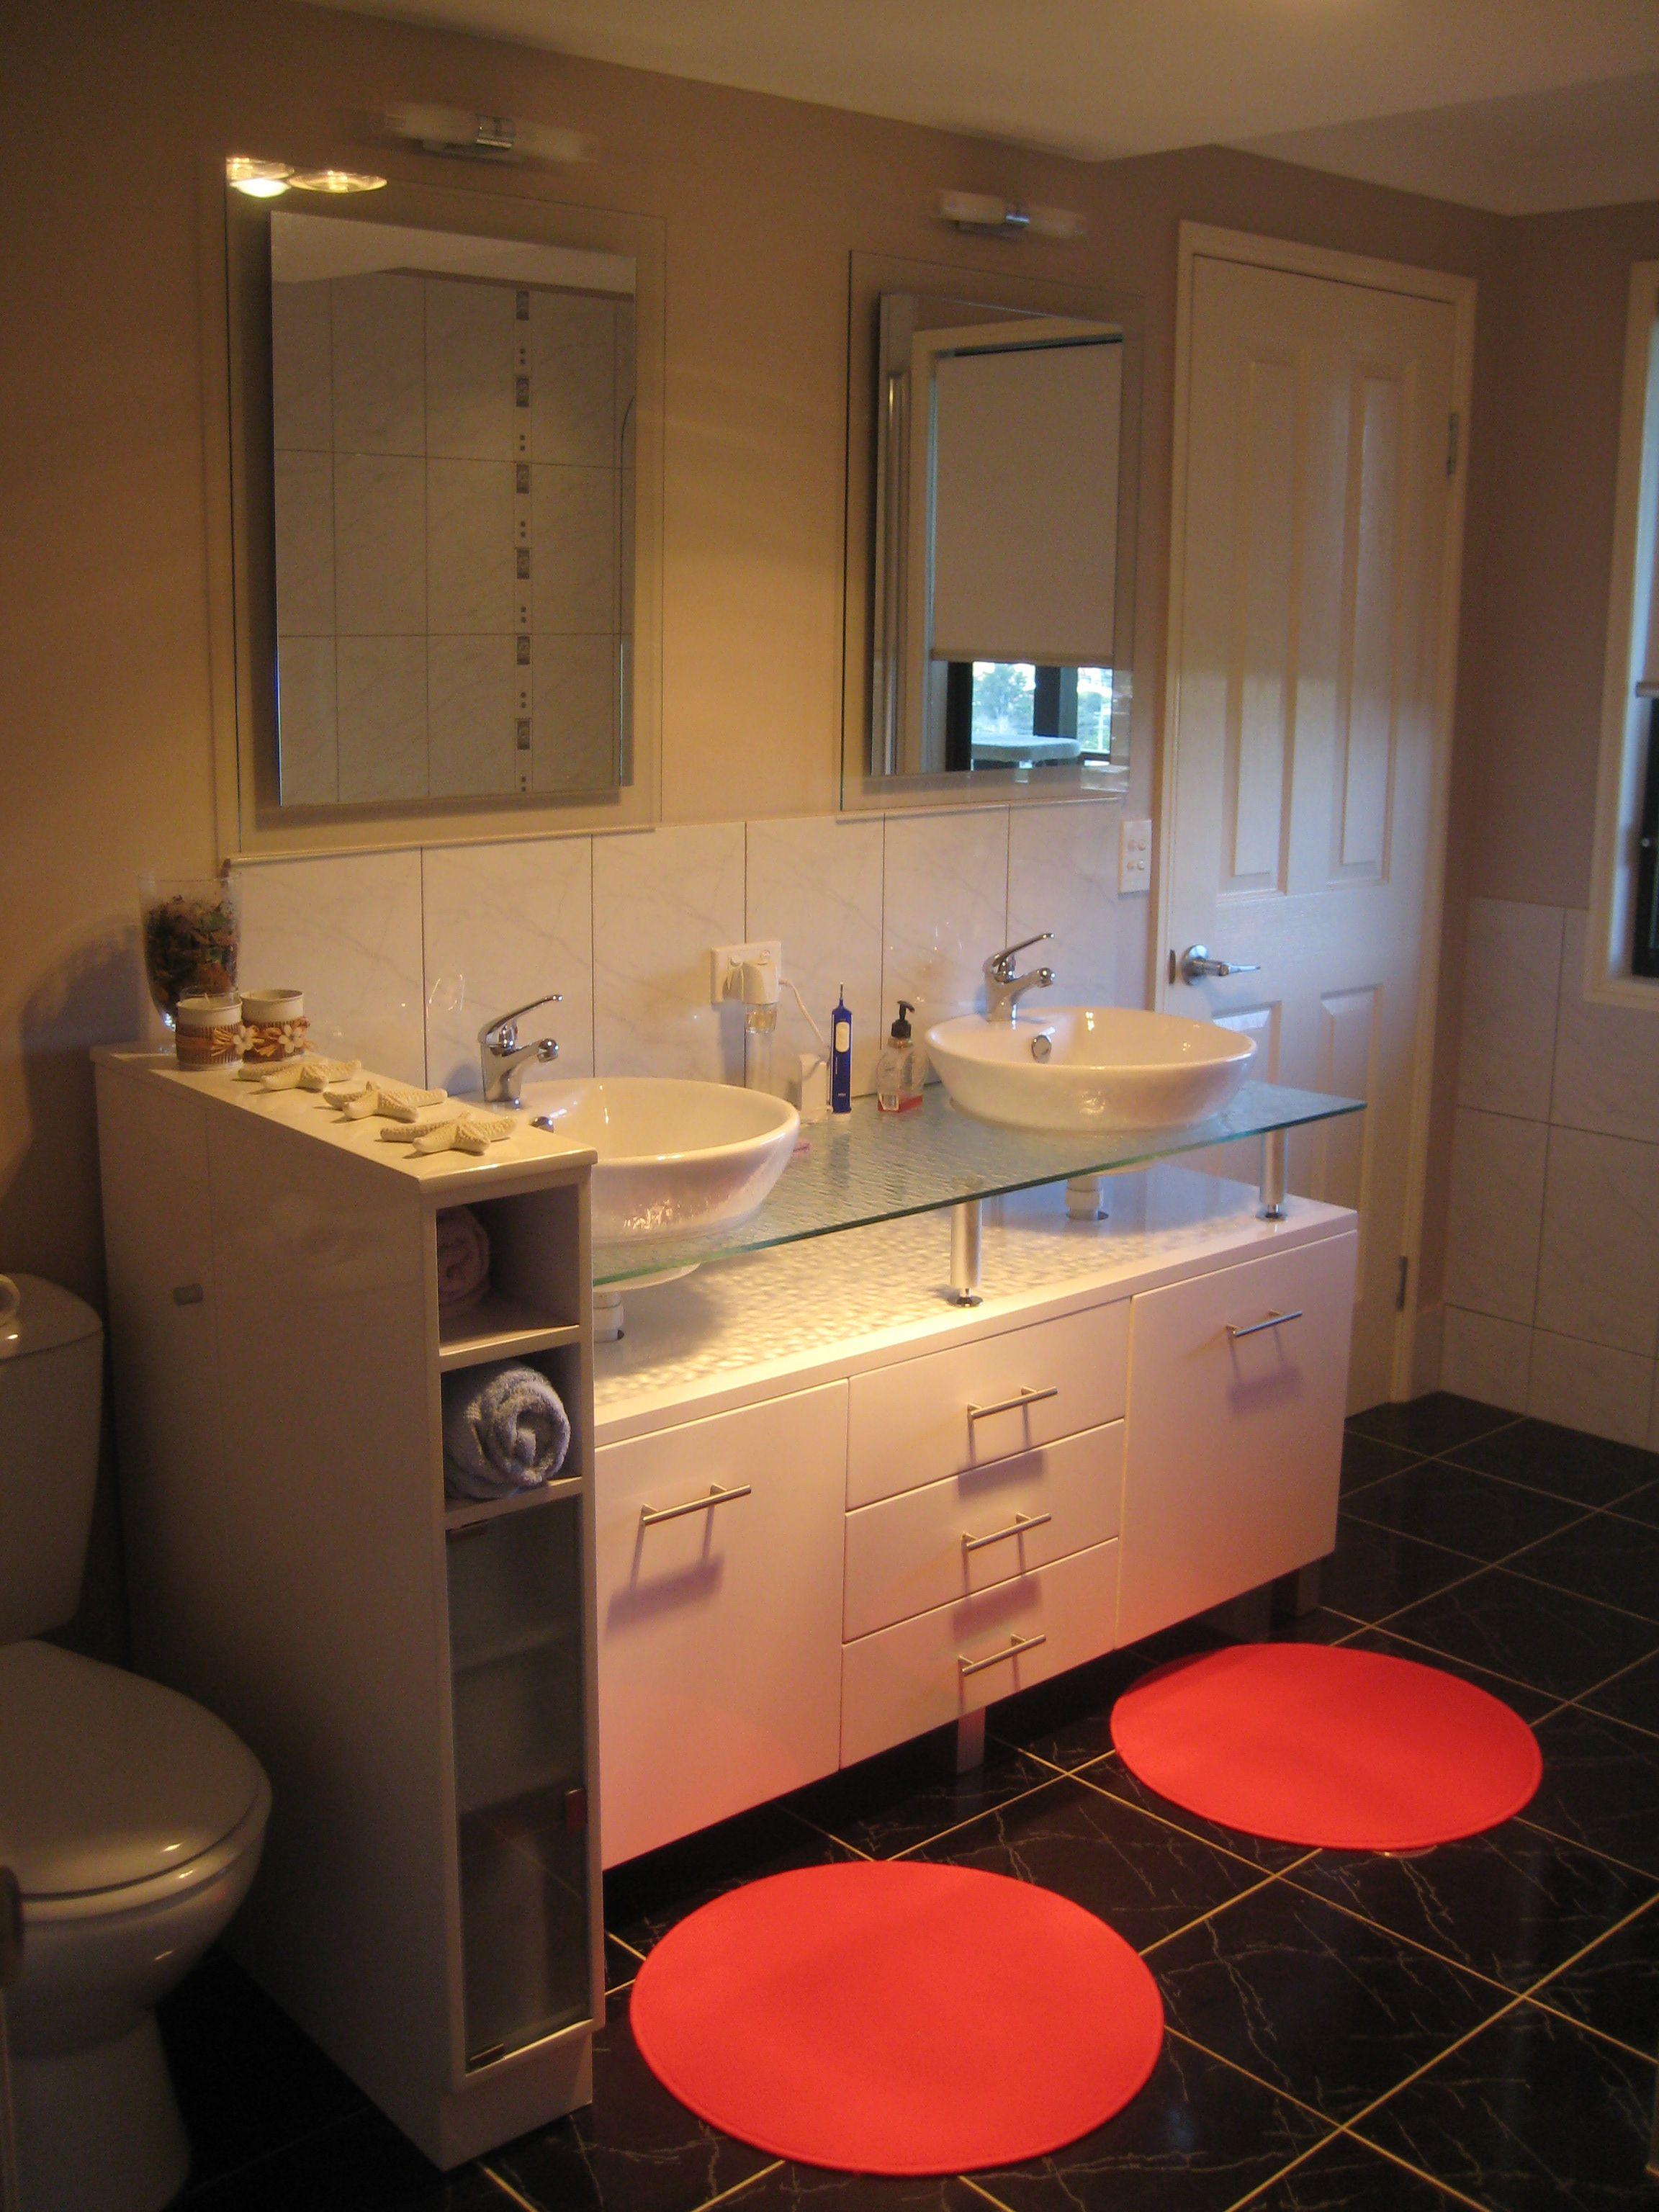 Energy Efficient Homes - Bathroom Ideas | Bathroom redo ...